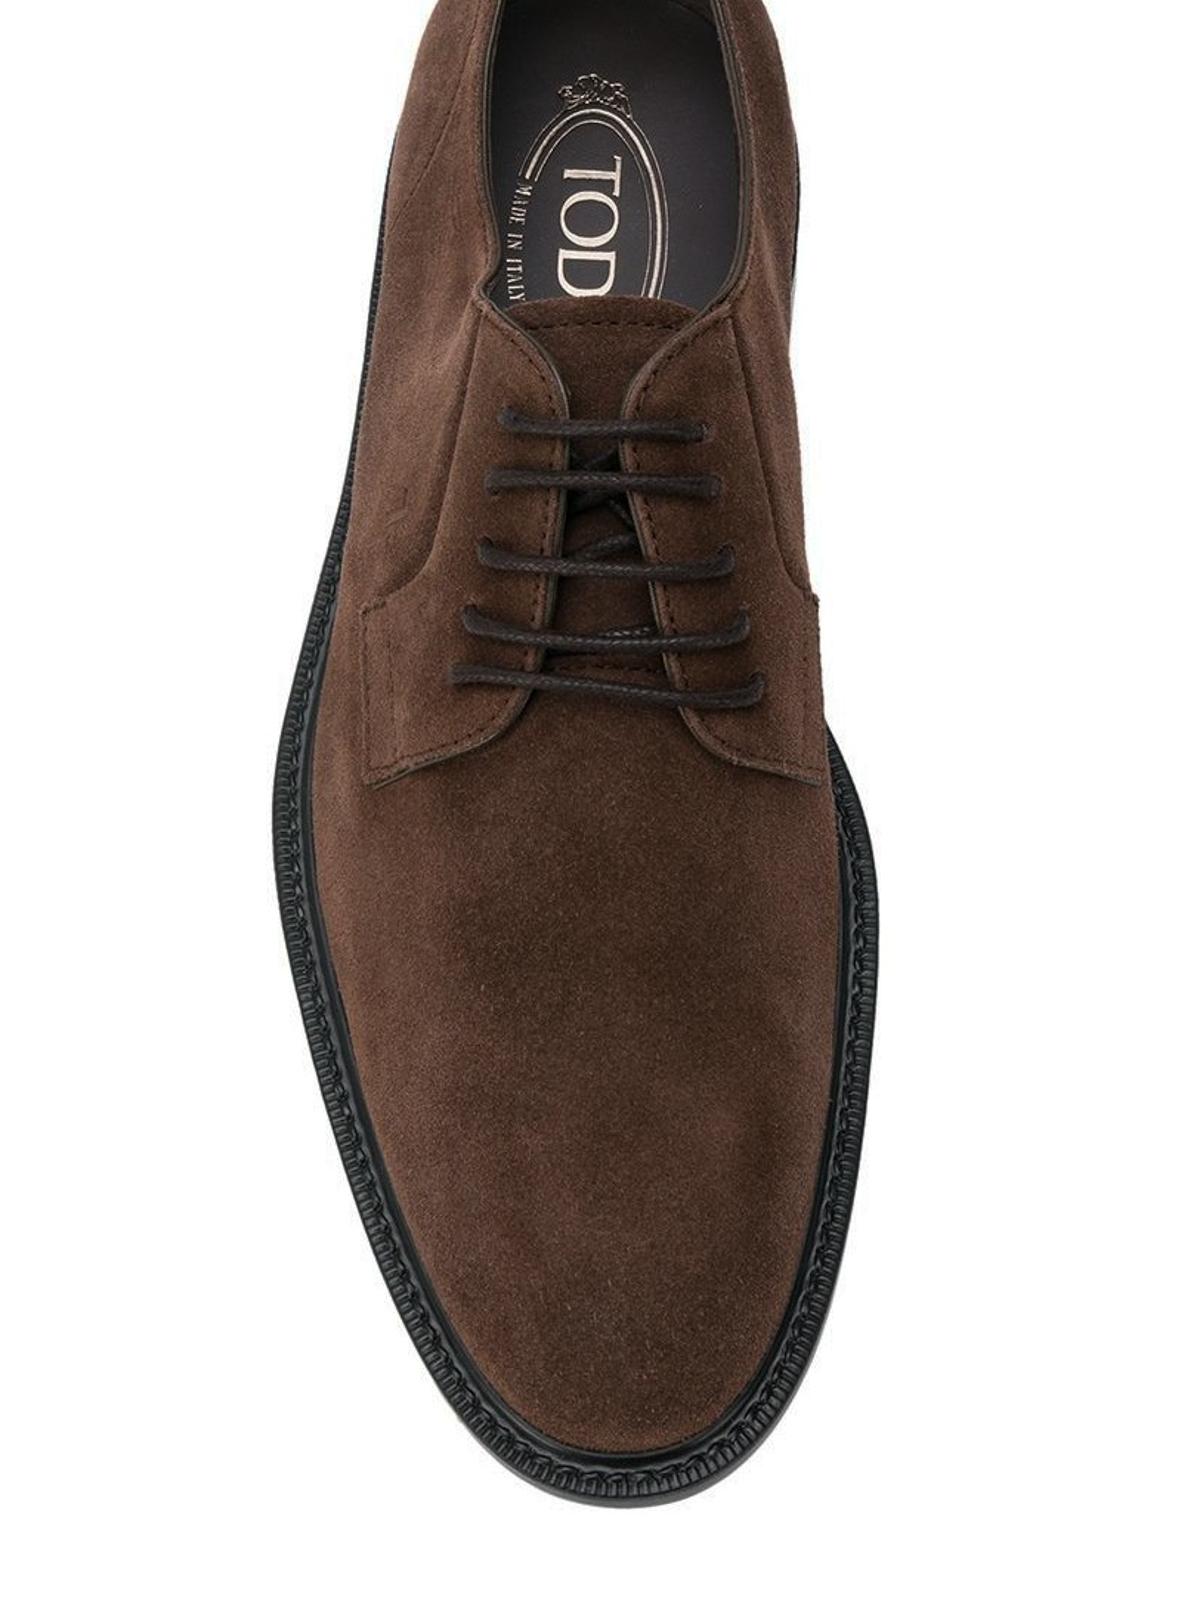 541915bf67dcf4 Tod'S - Derby stringate in camoscio marrone - scarpe stringate -  XXM45A0H370RE0S402